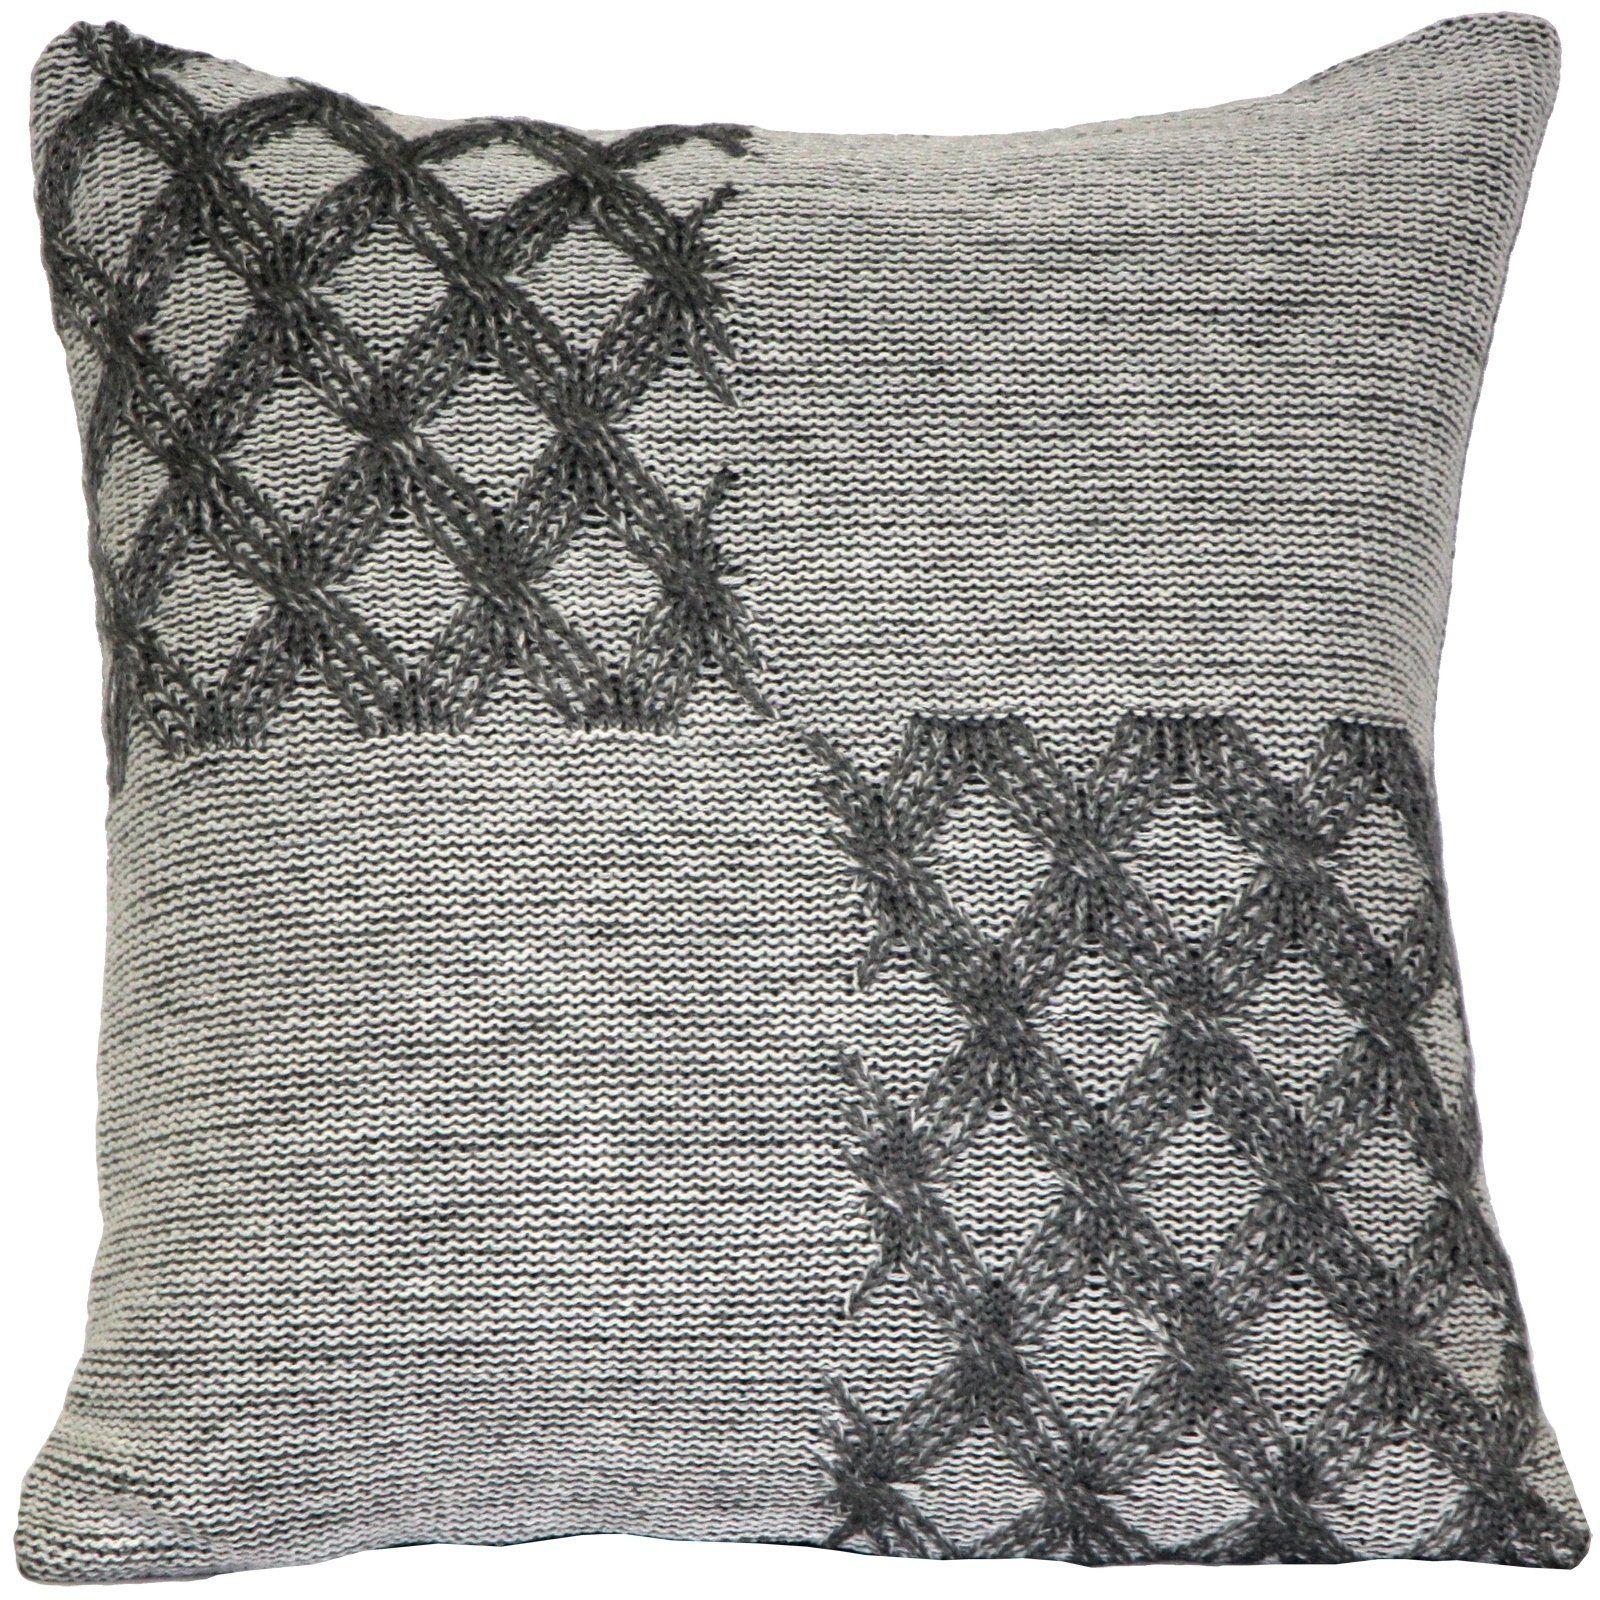 Pillow Décor - Hygge Morning Gray Knit Pillow, Grey, Pillow Decor - 18 x 18 (Ac...